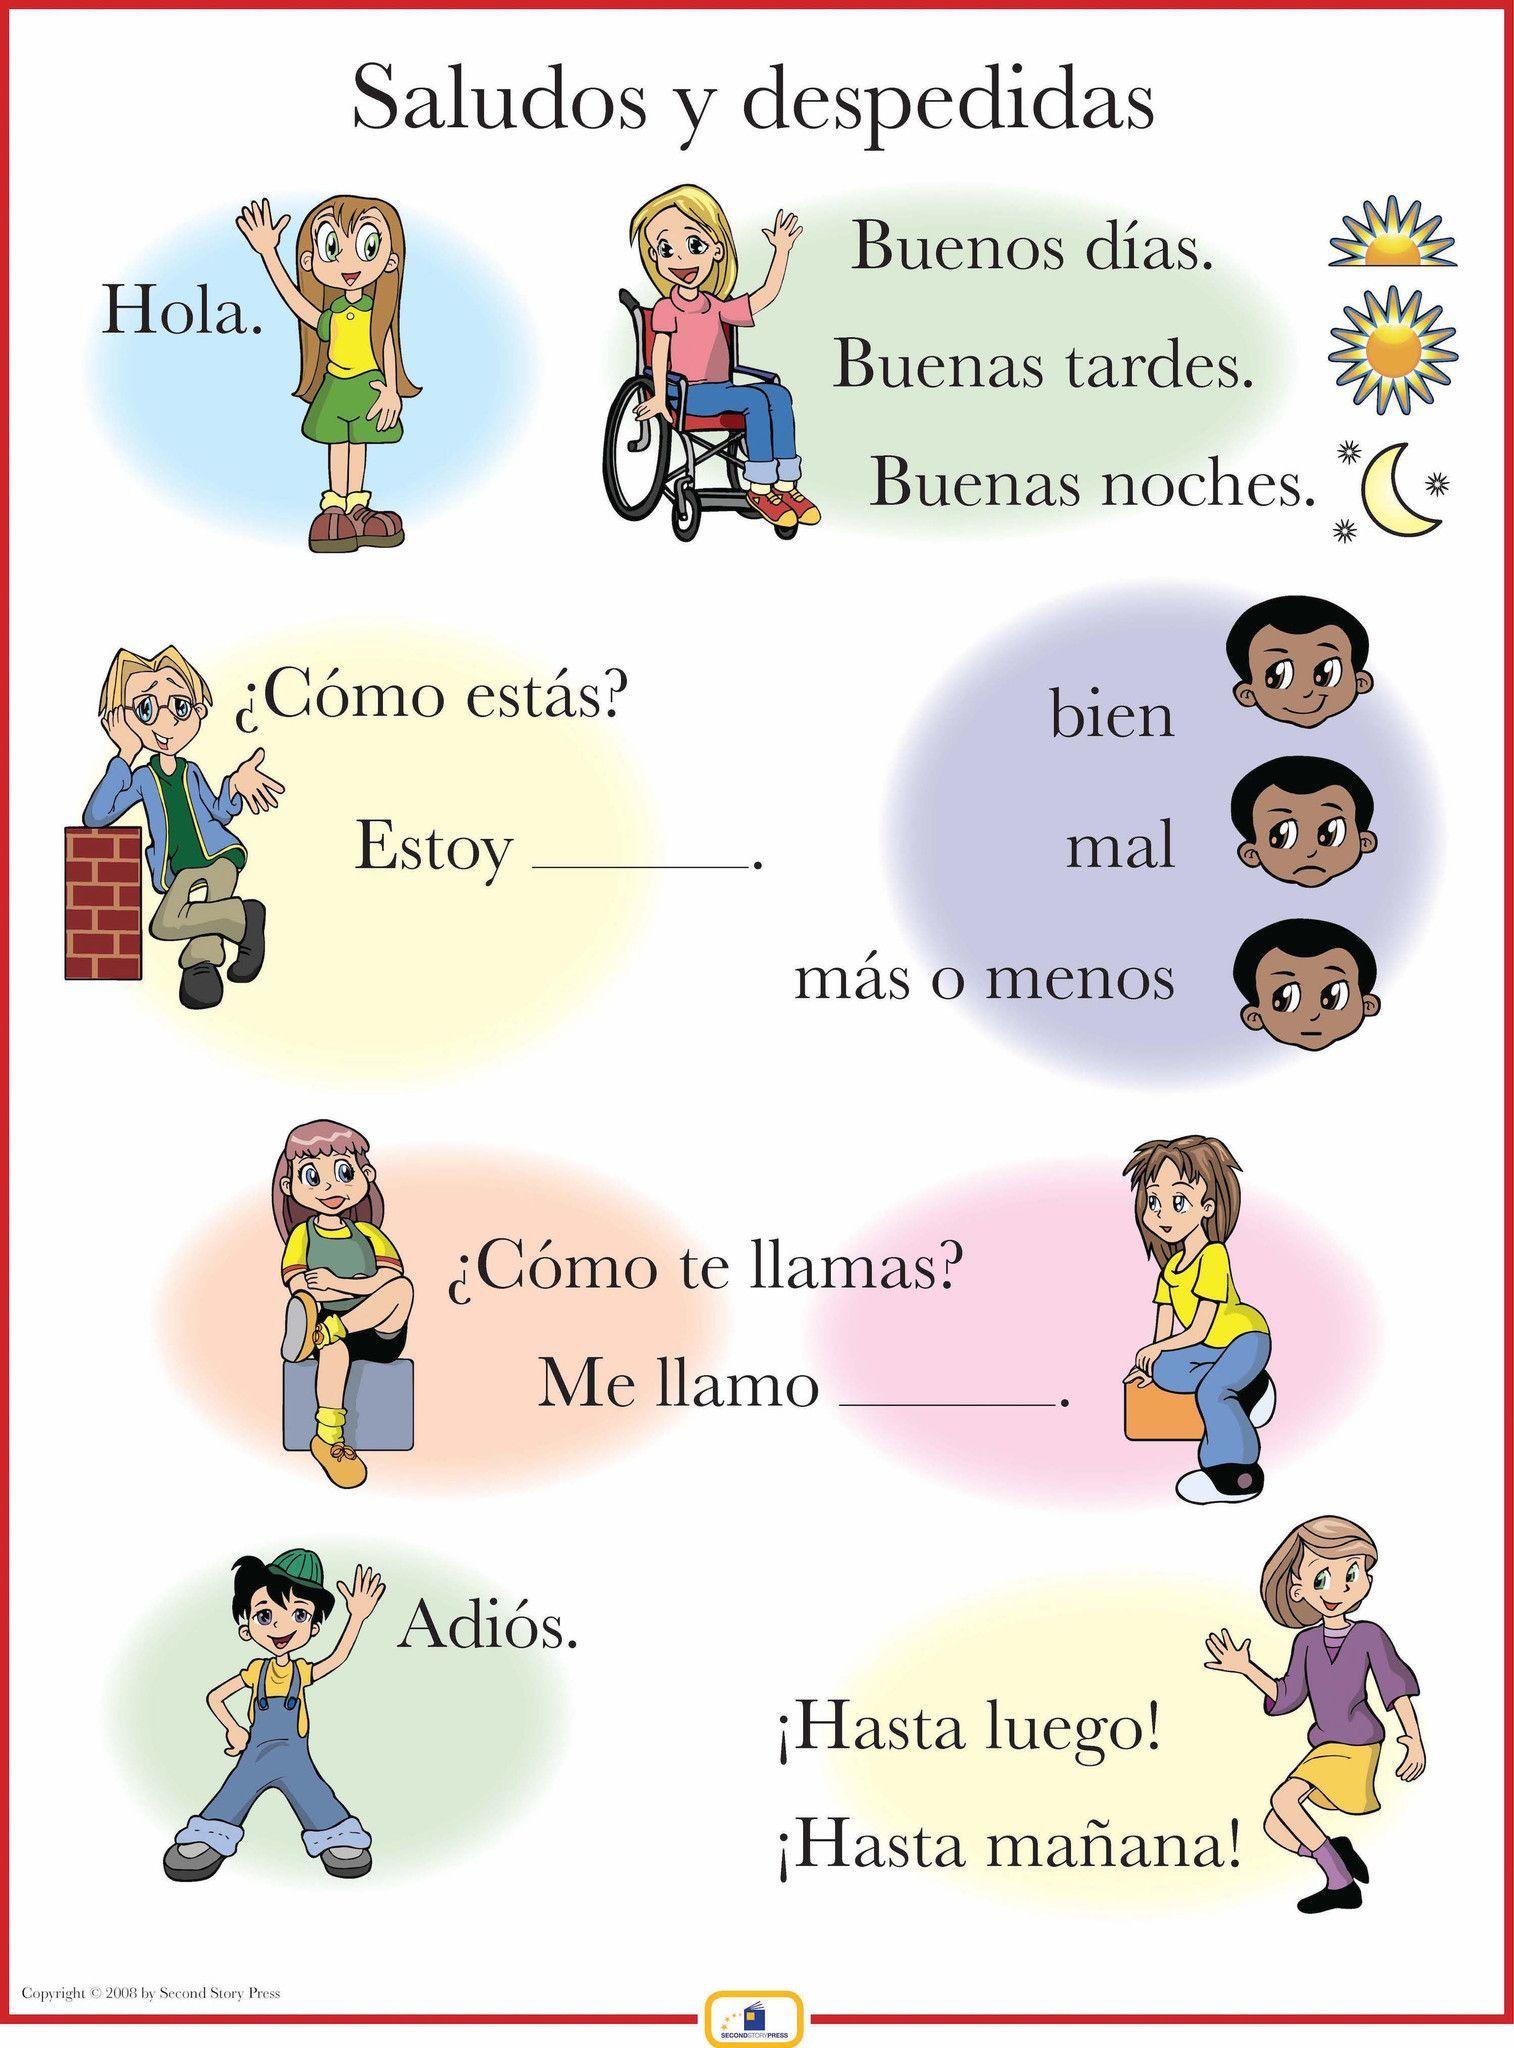 Easy Way To Speak Spanish